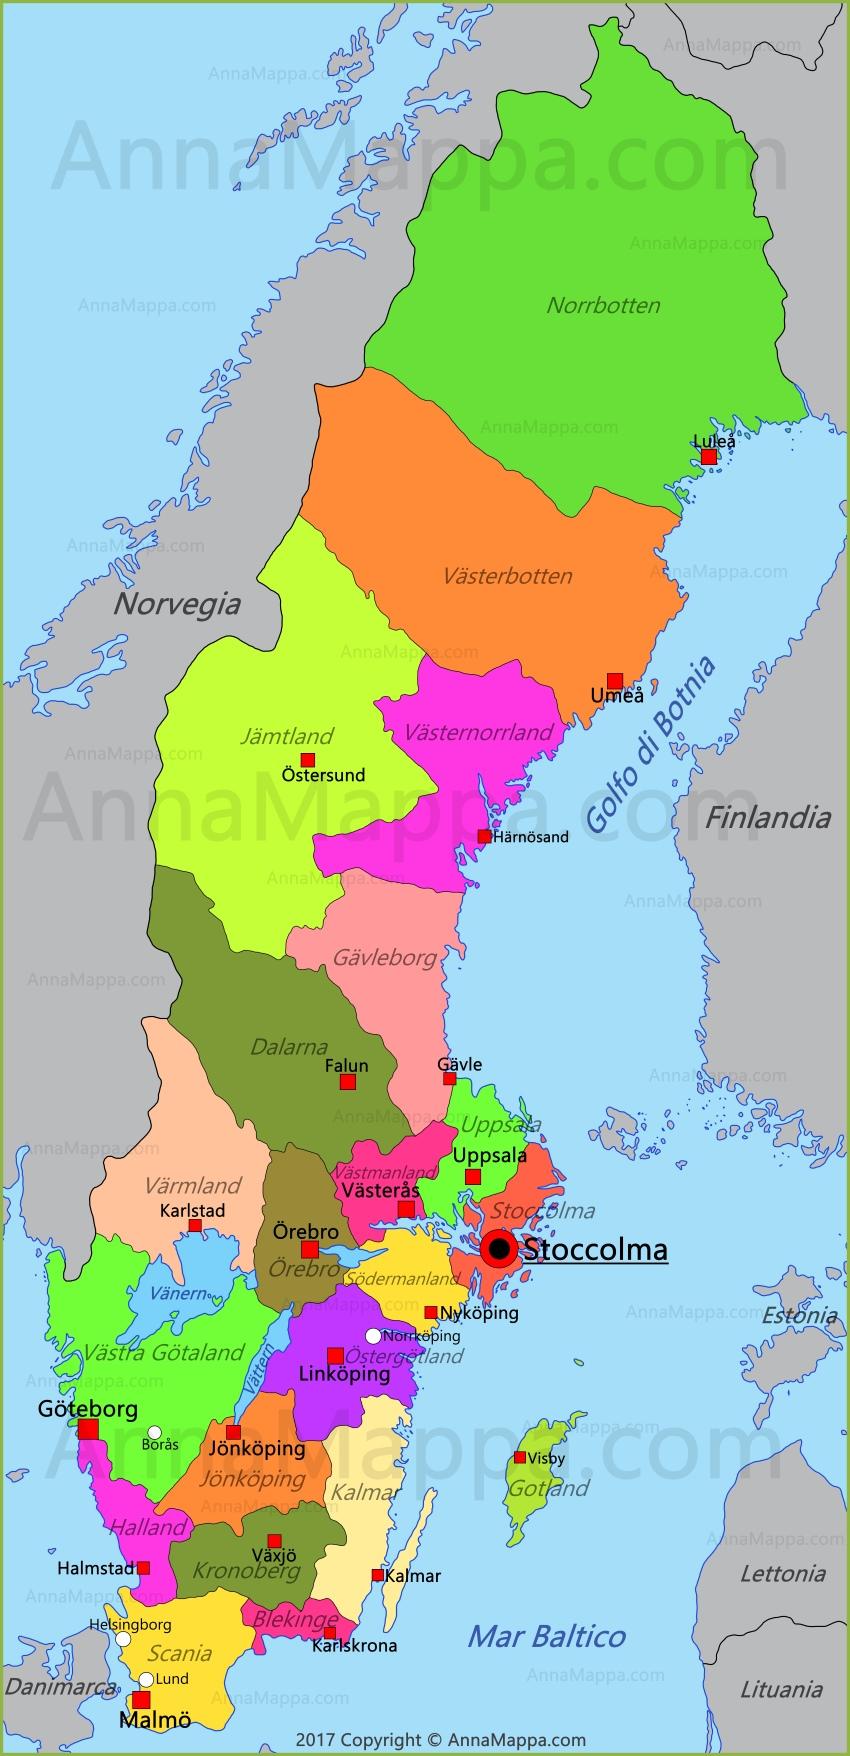 Cartina Della Svezia.Mappa Svezia Annamappa Com